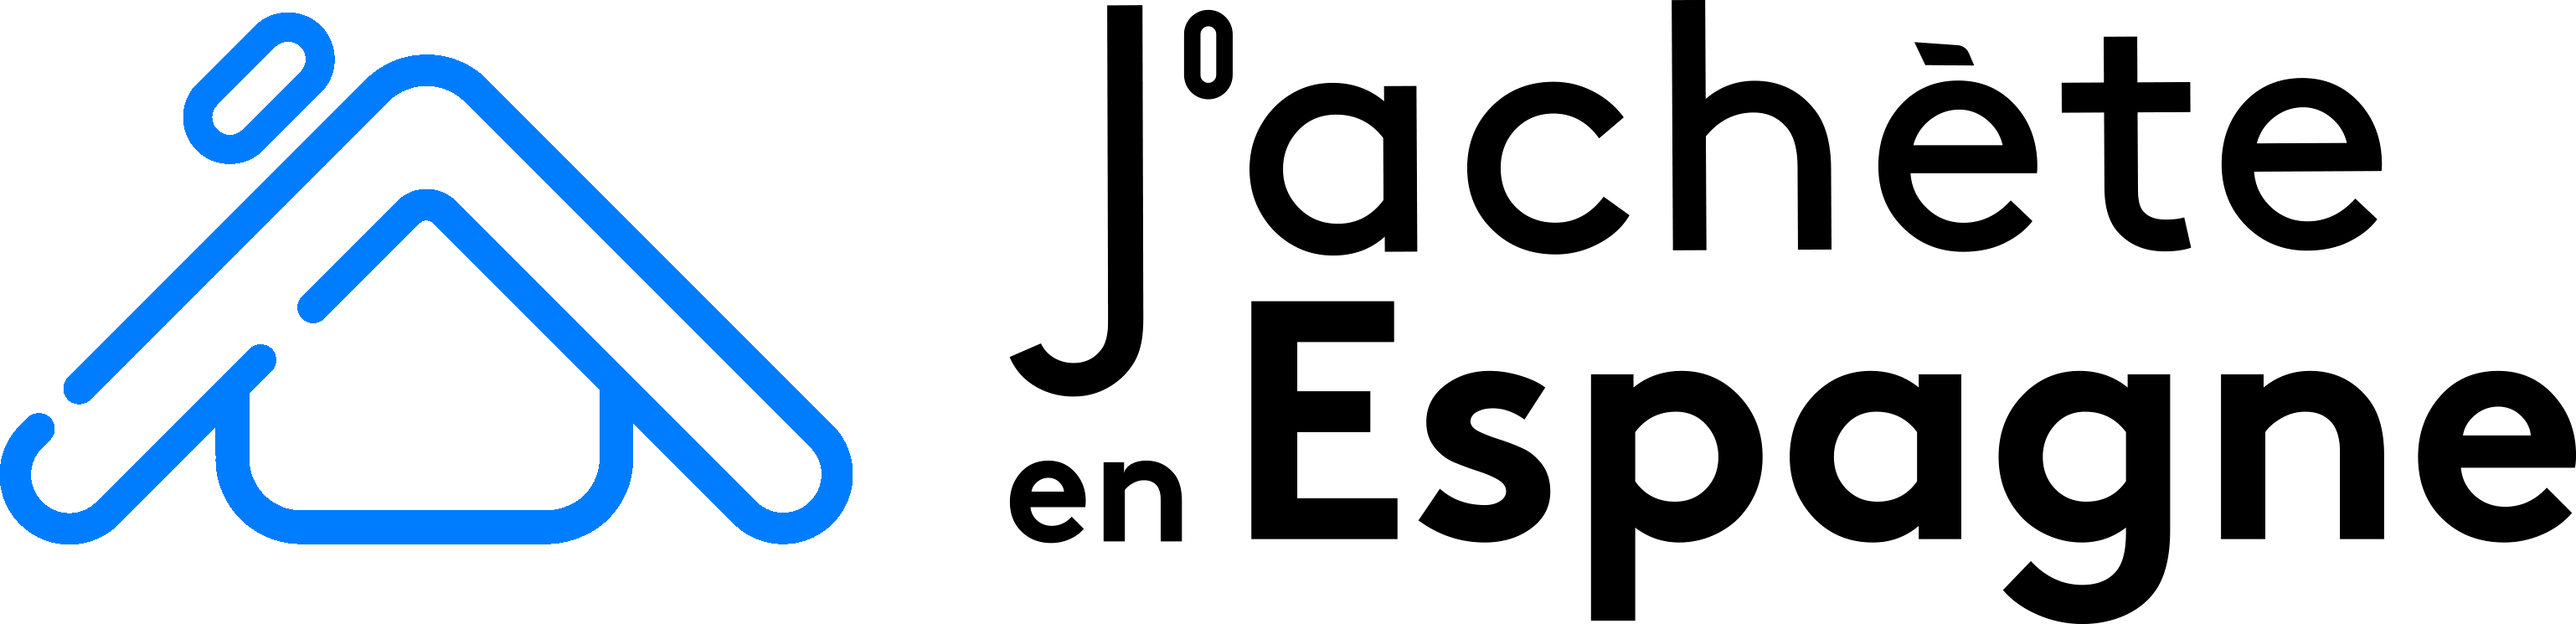 Jachete en Espagne